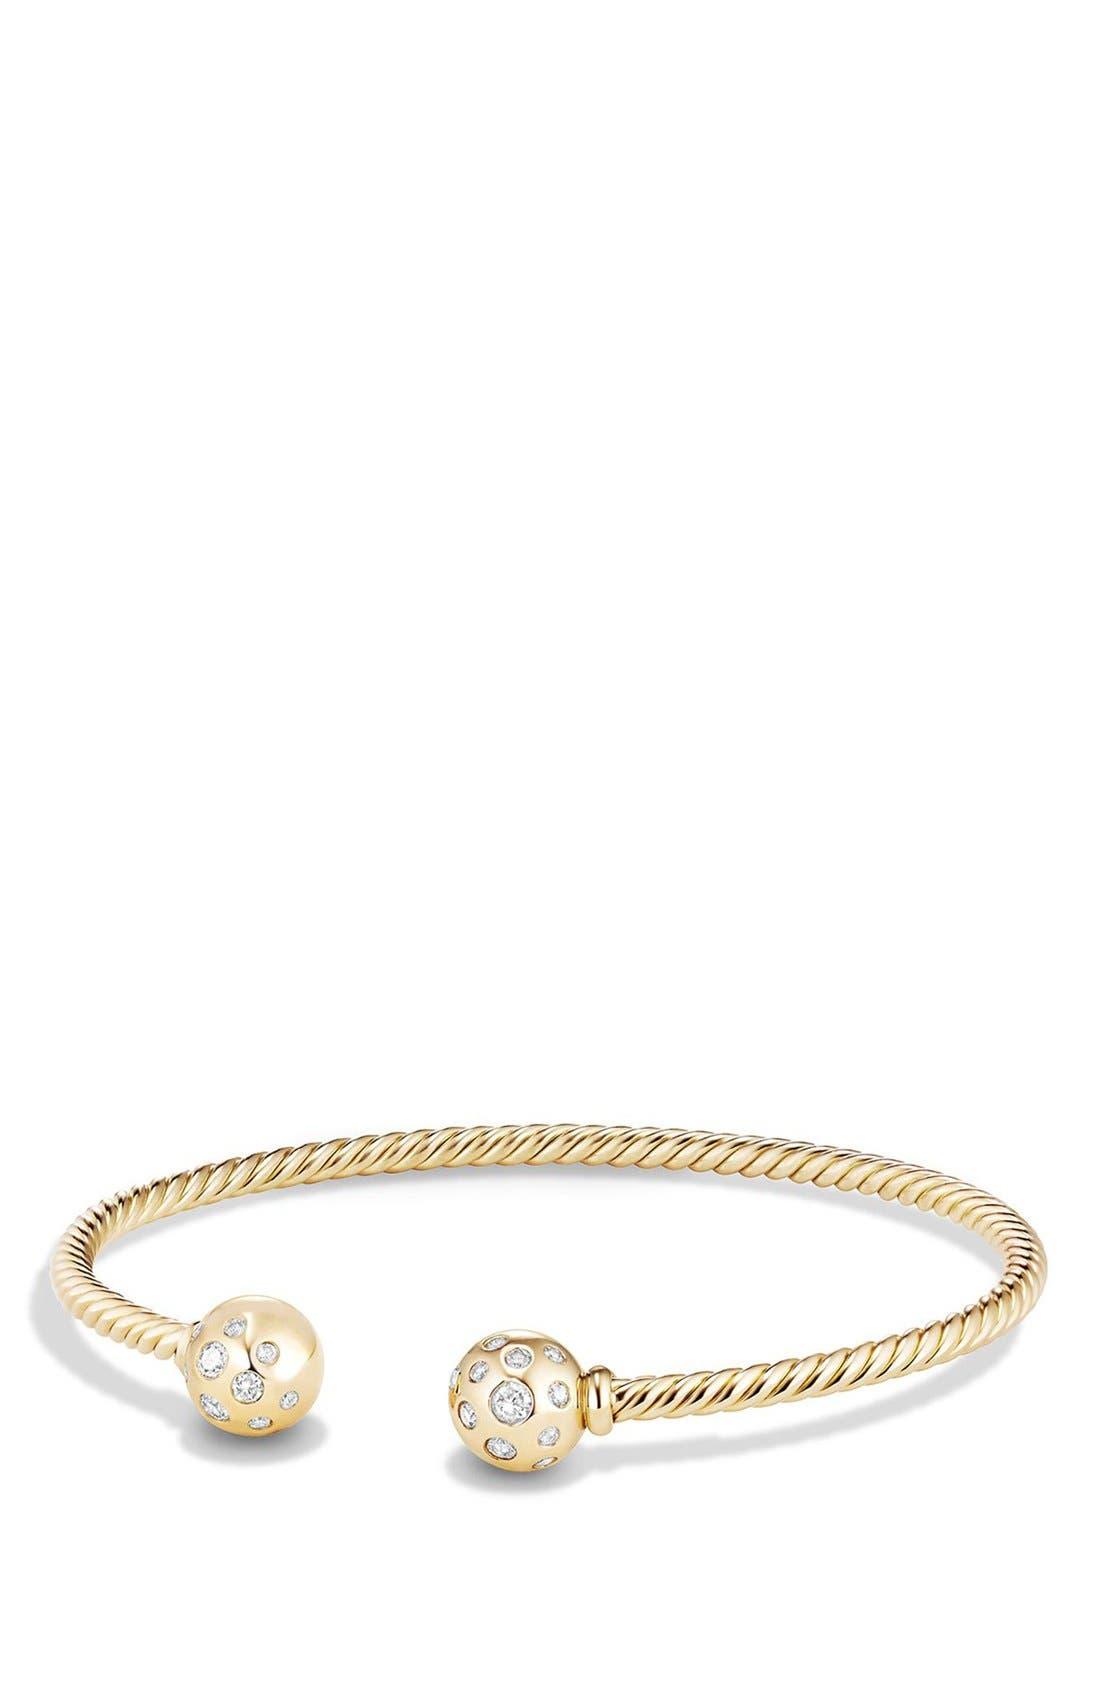 Main Image - David Yurman 'Solari' Bracelet with Diamonds in 18K Gold